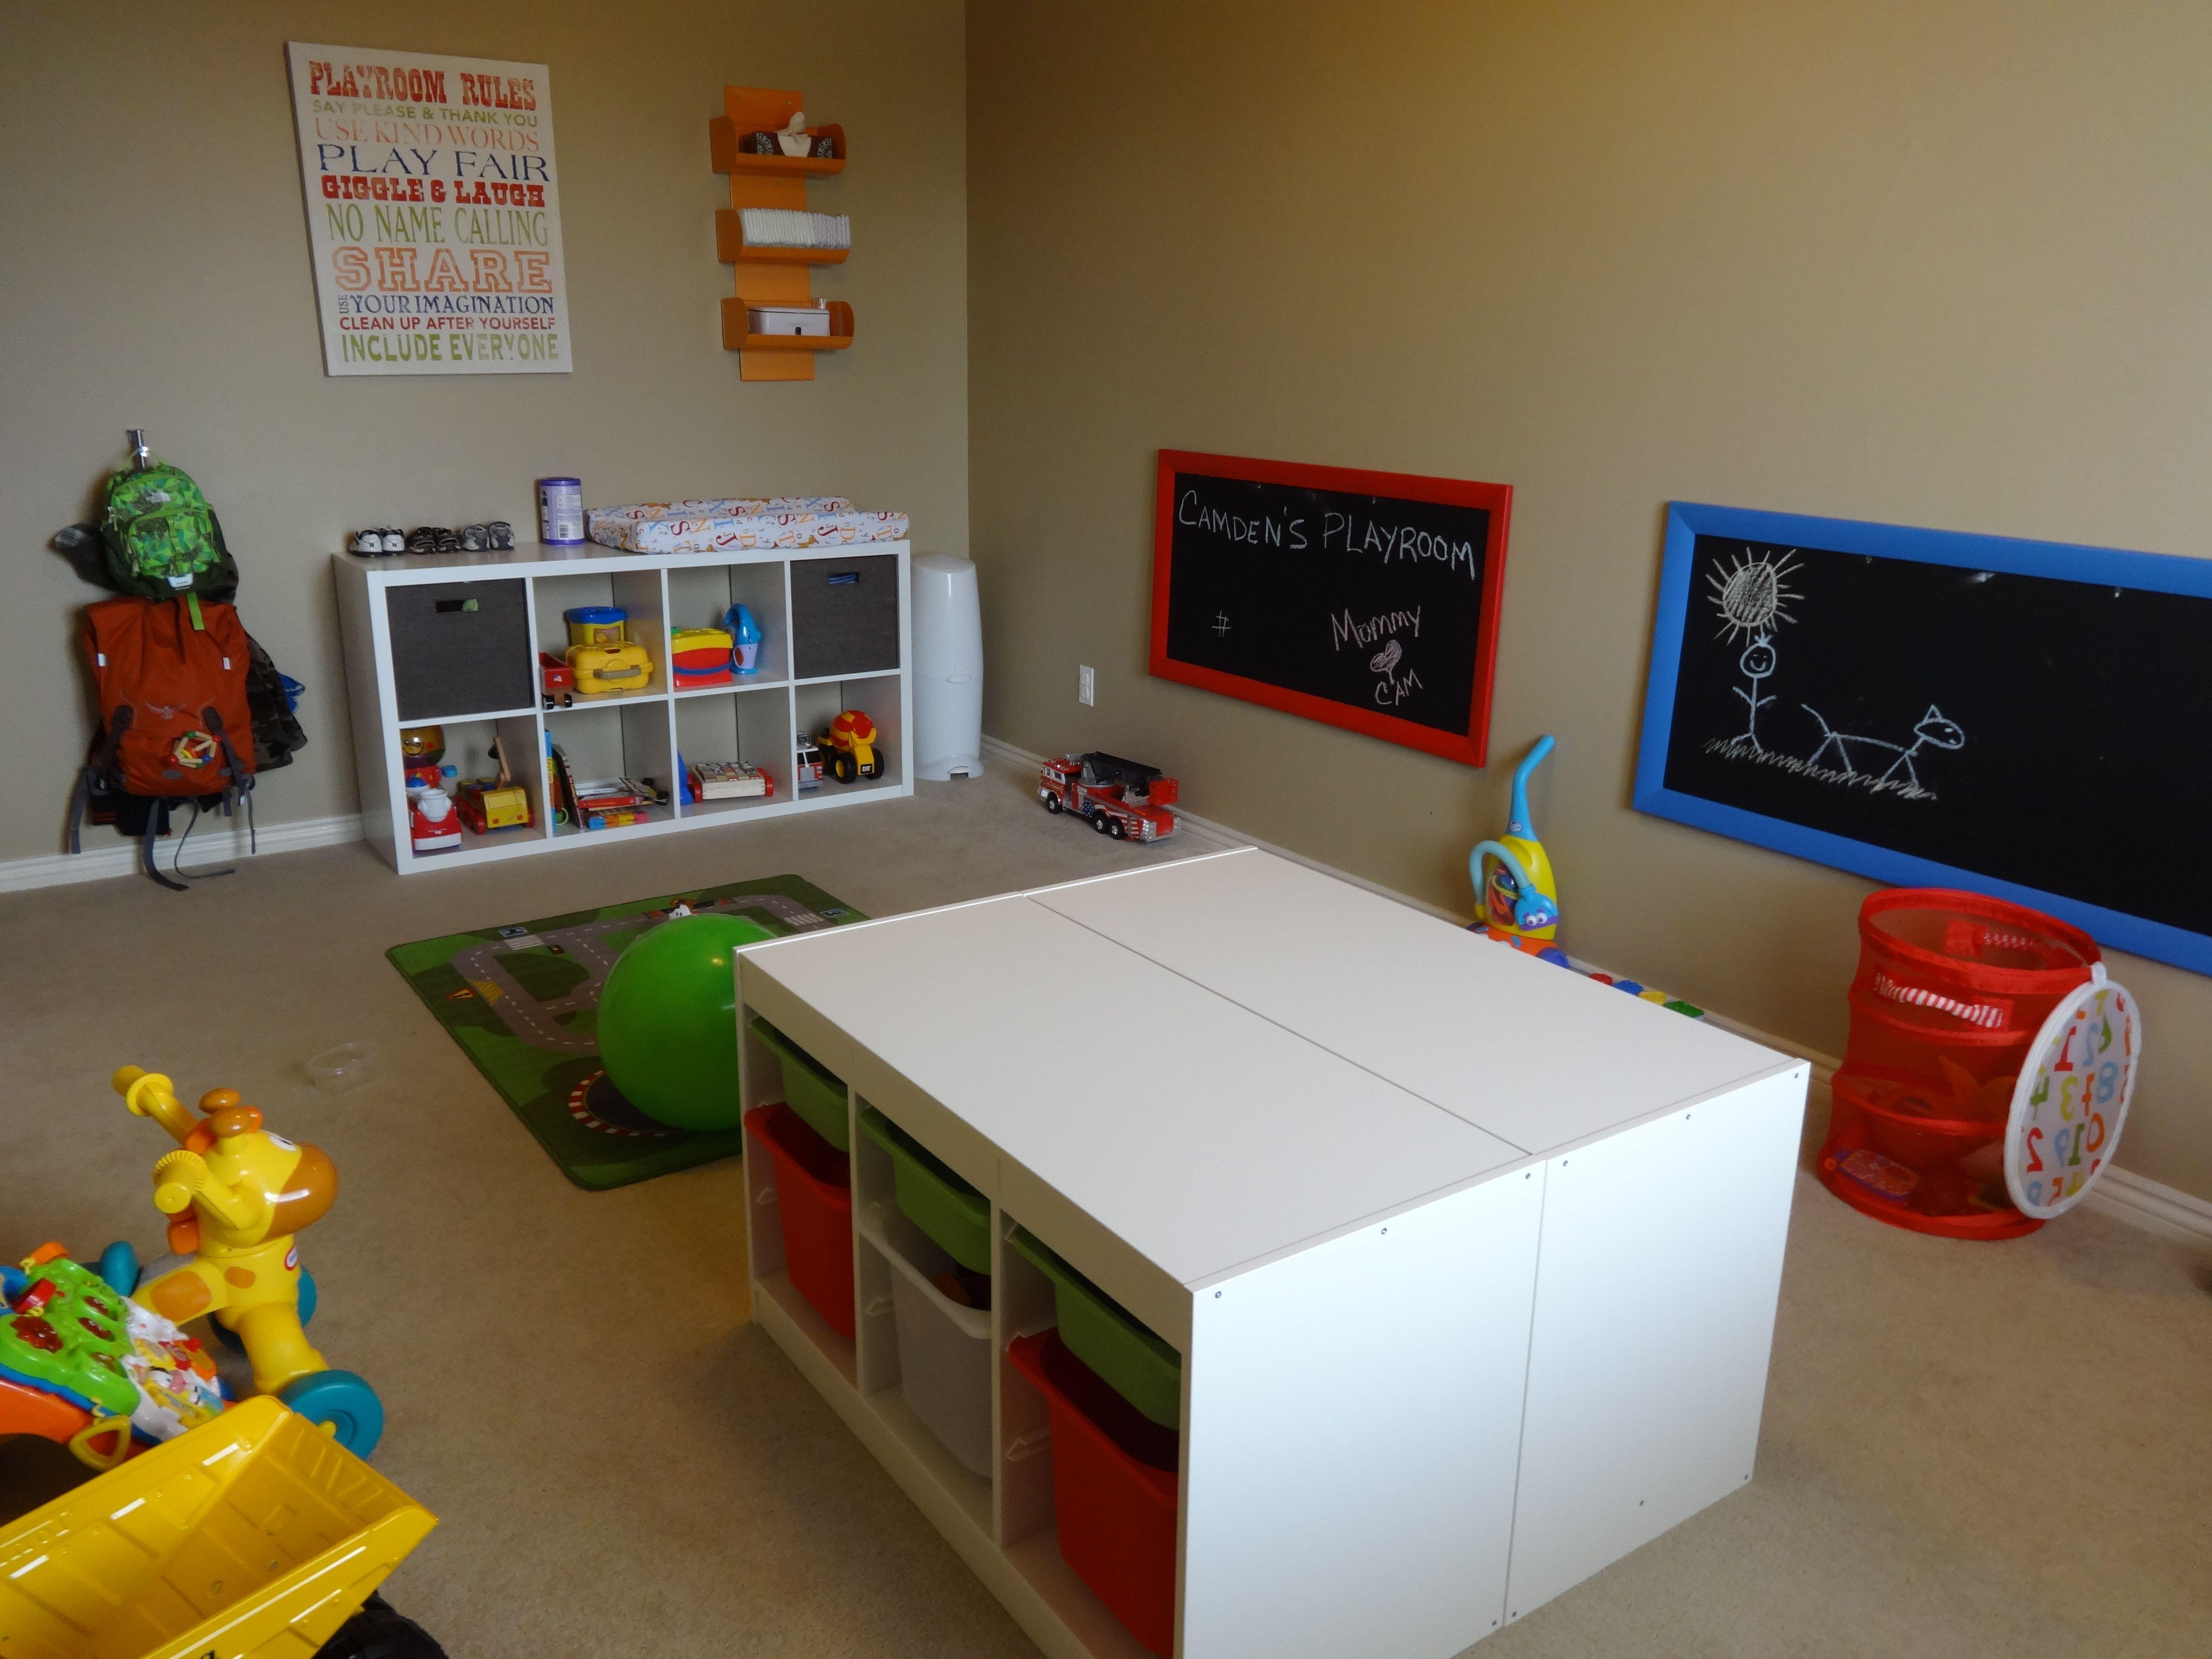 Pin By Carla Alvarado On Playroom Ikea Trofast Playroom Kids Play Room Organization